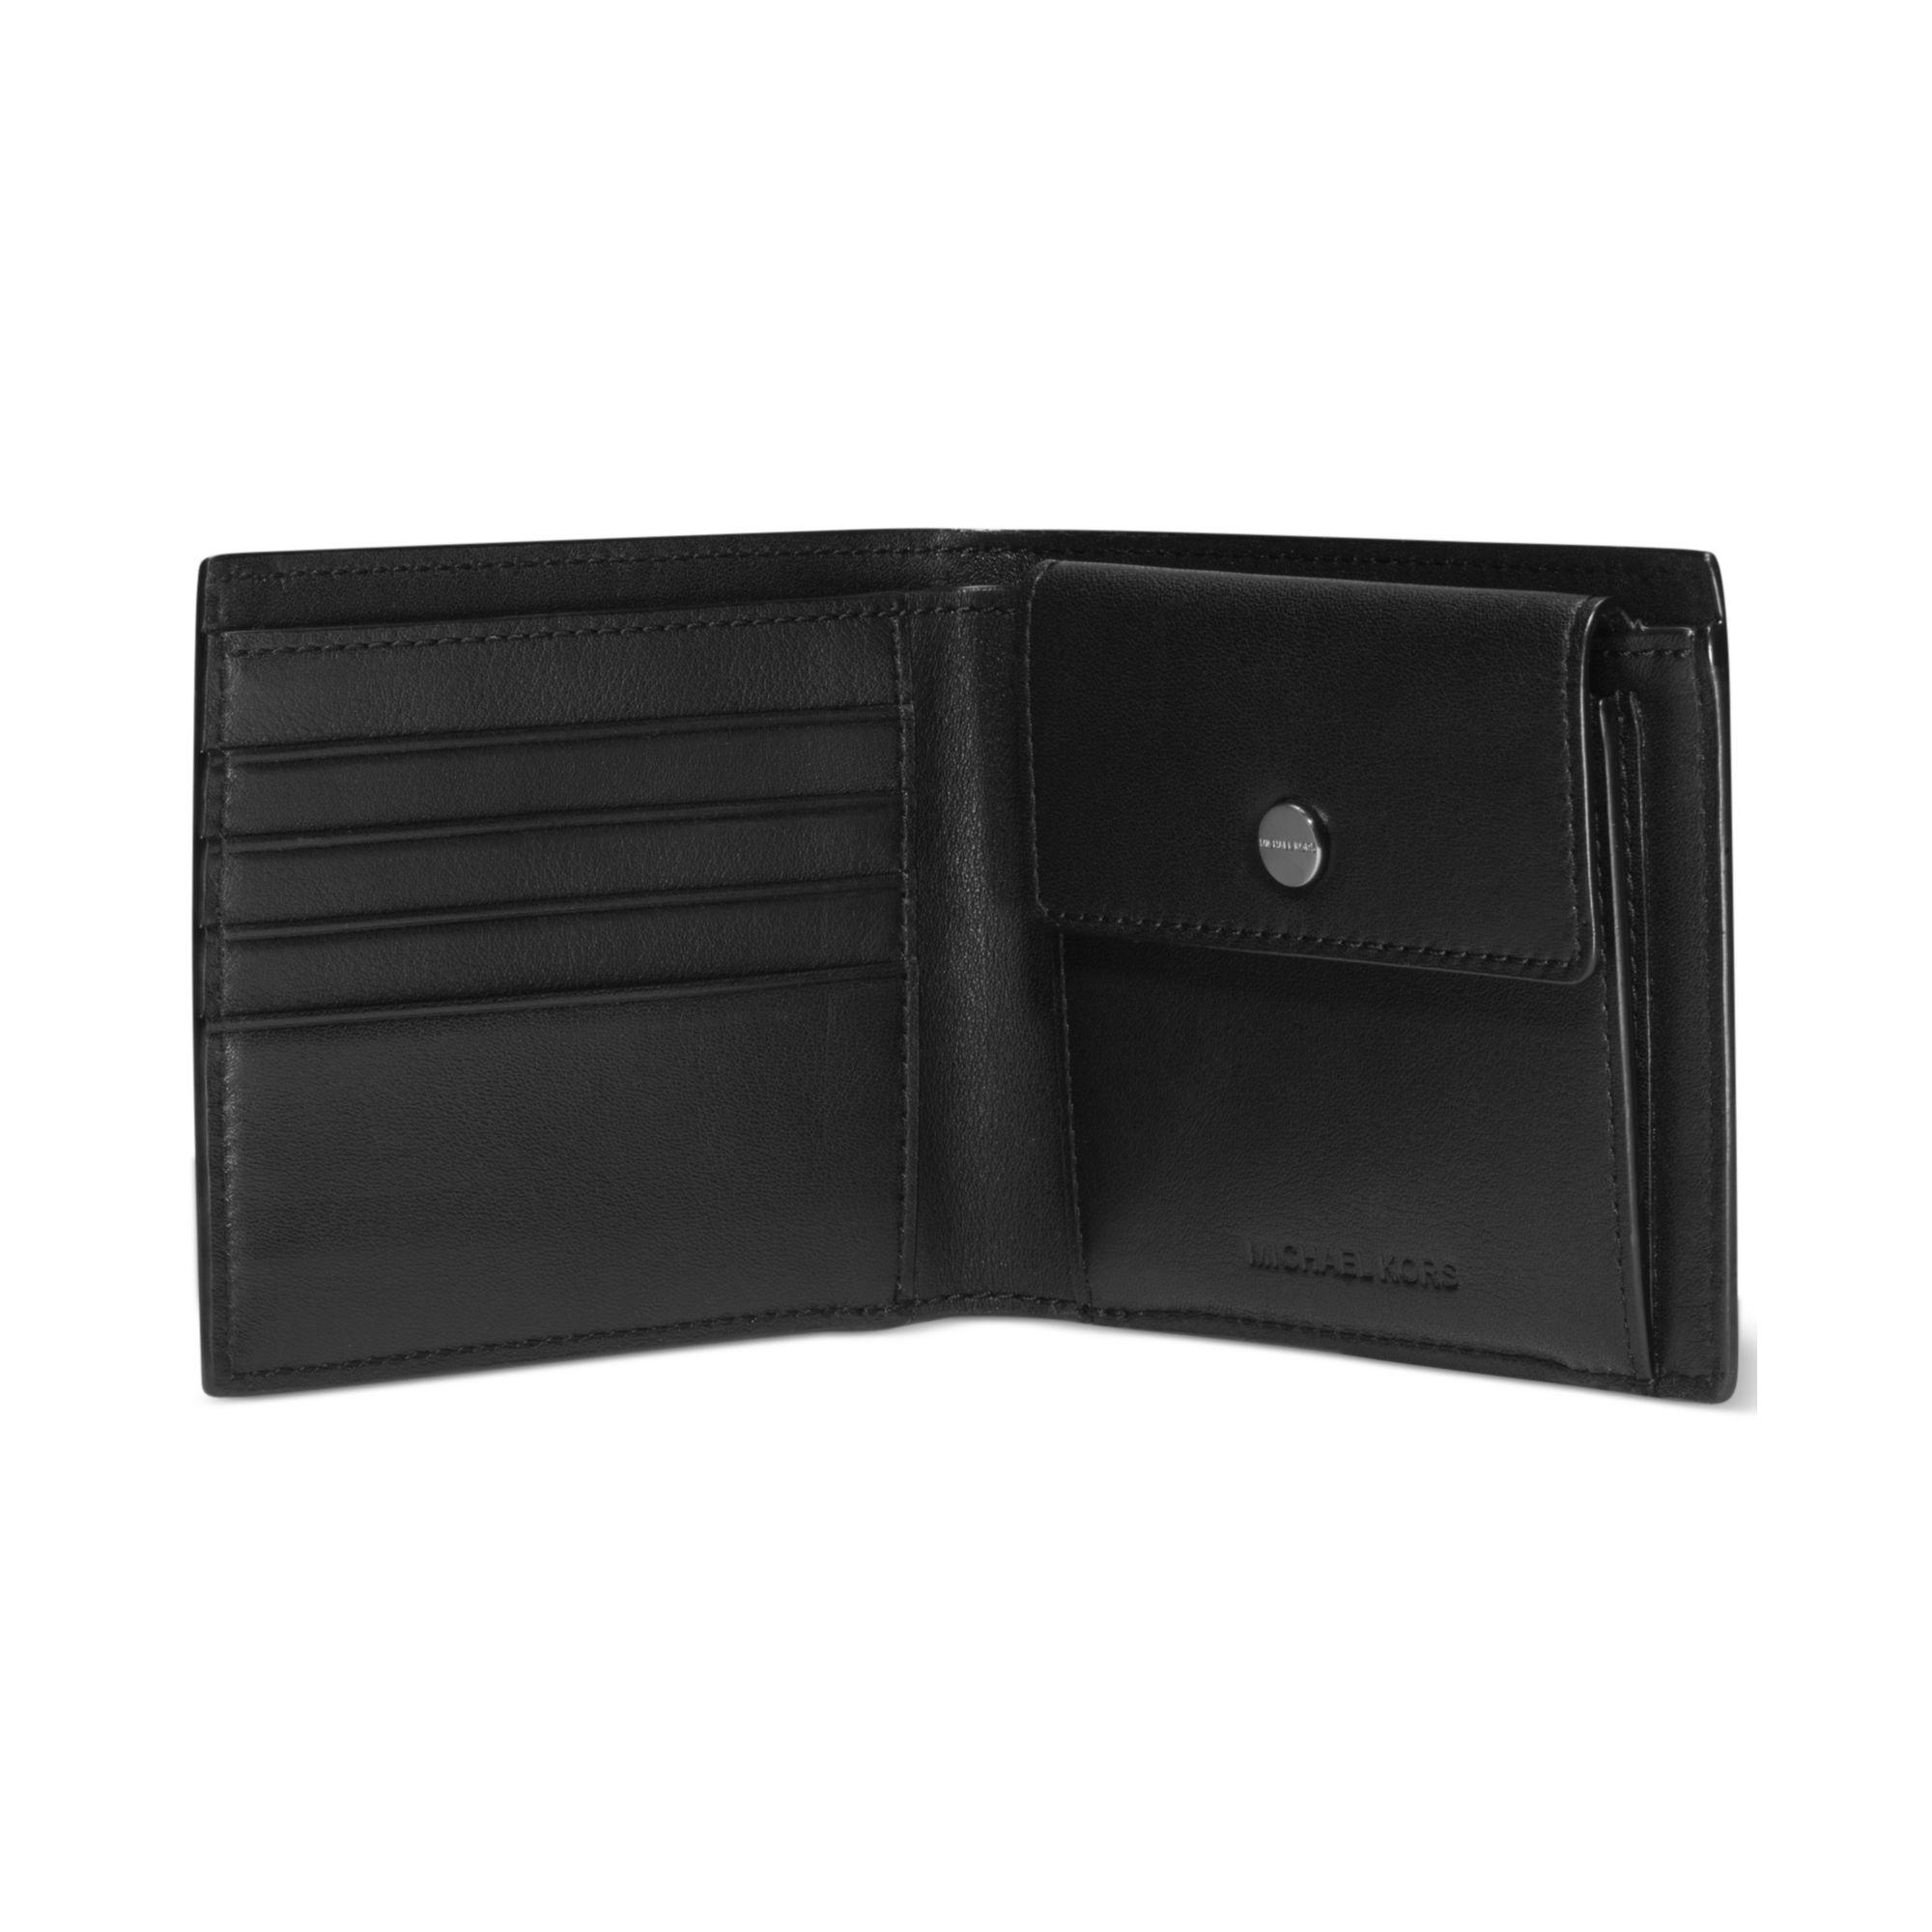 35d3ae4e123a Michael Kors Bifold Logo Wallet Womens | Stanford Center for ...